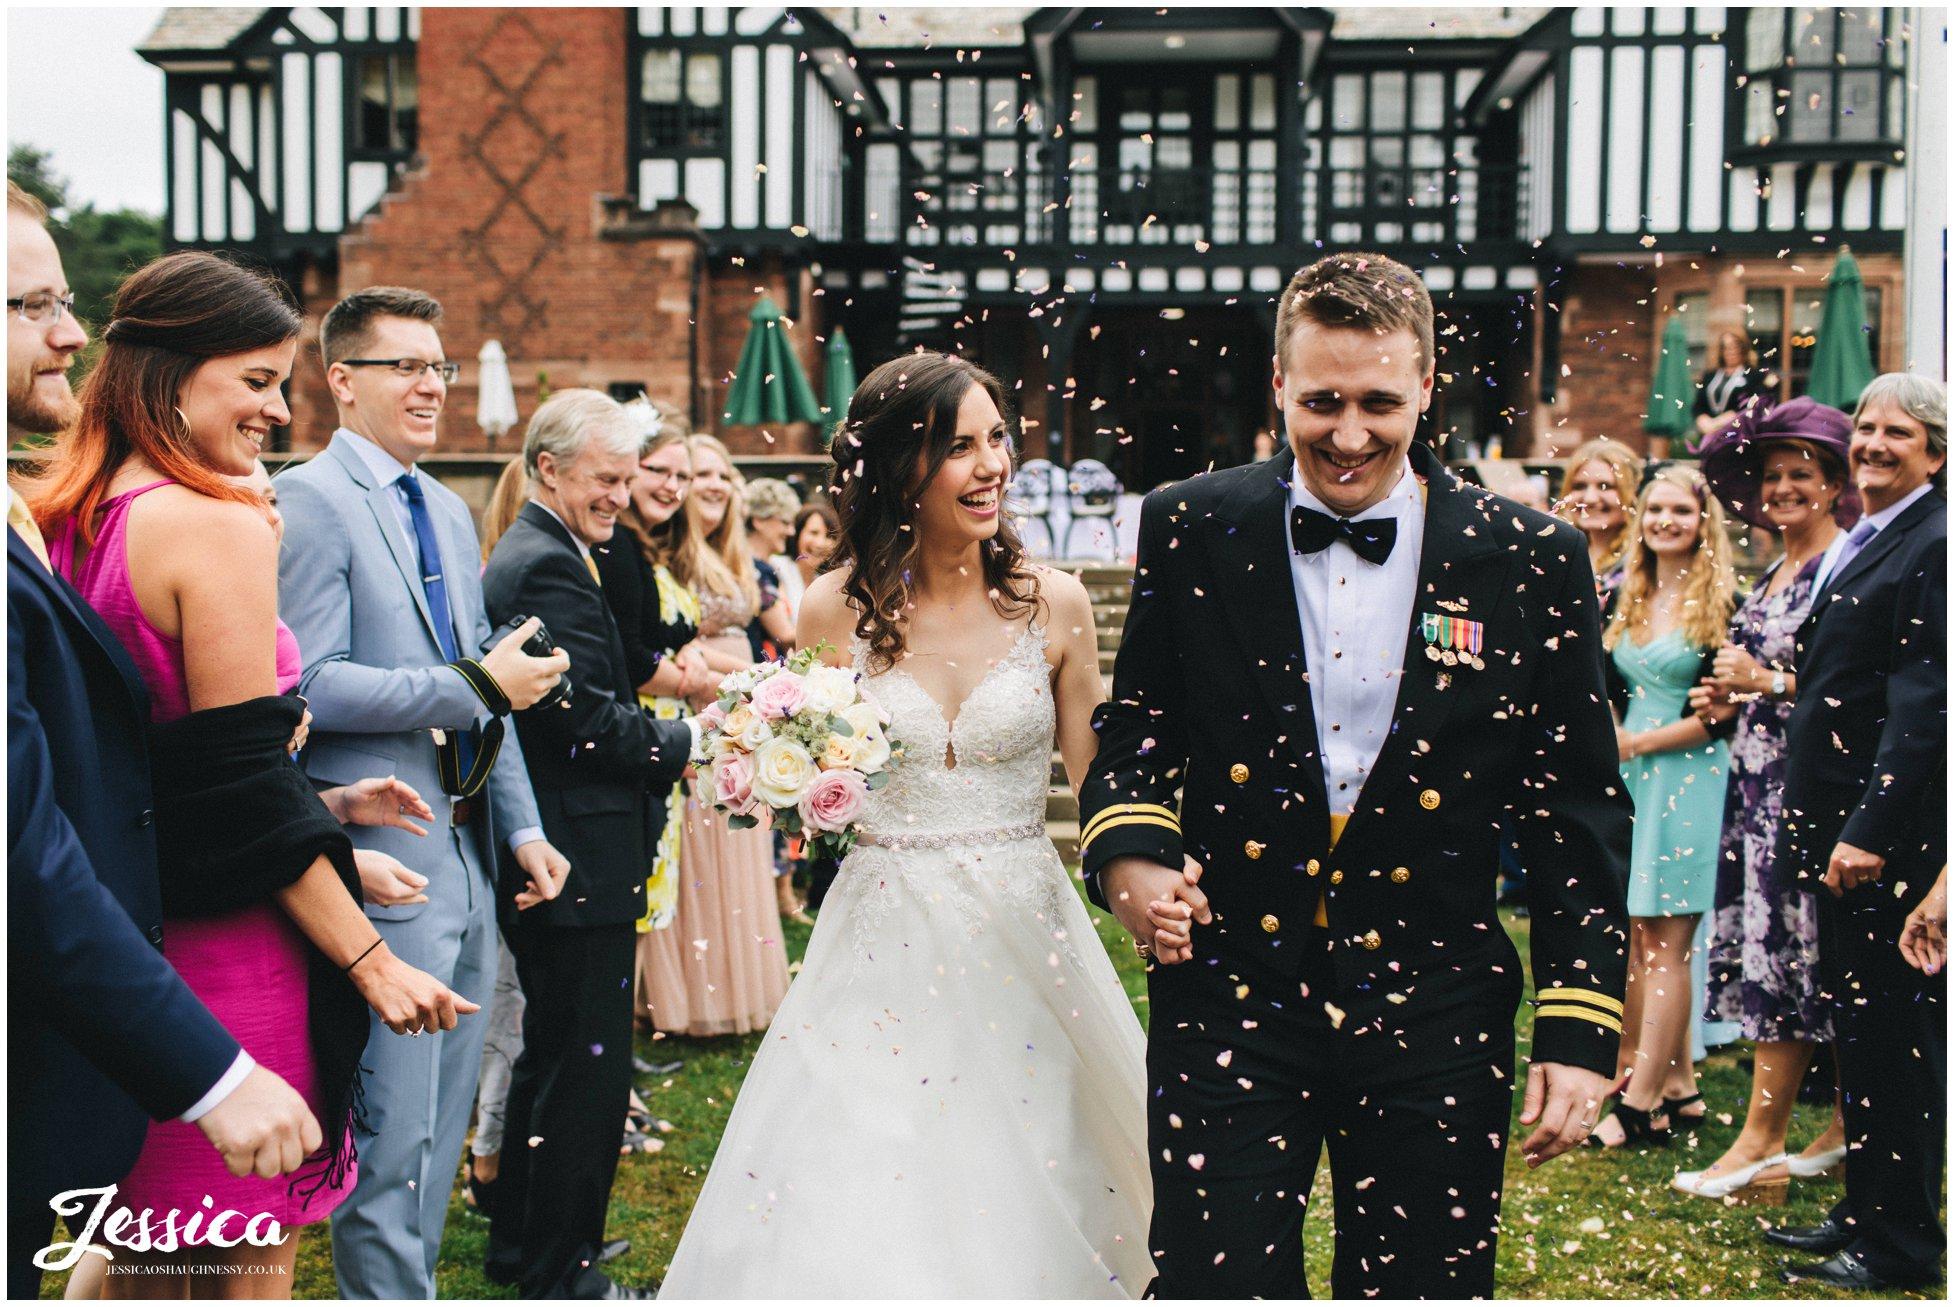 the bride and groom walk through confetti line